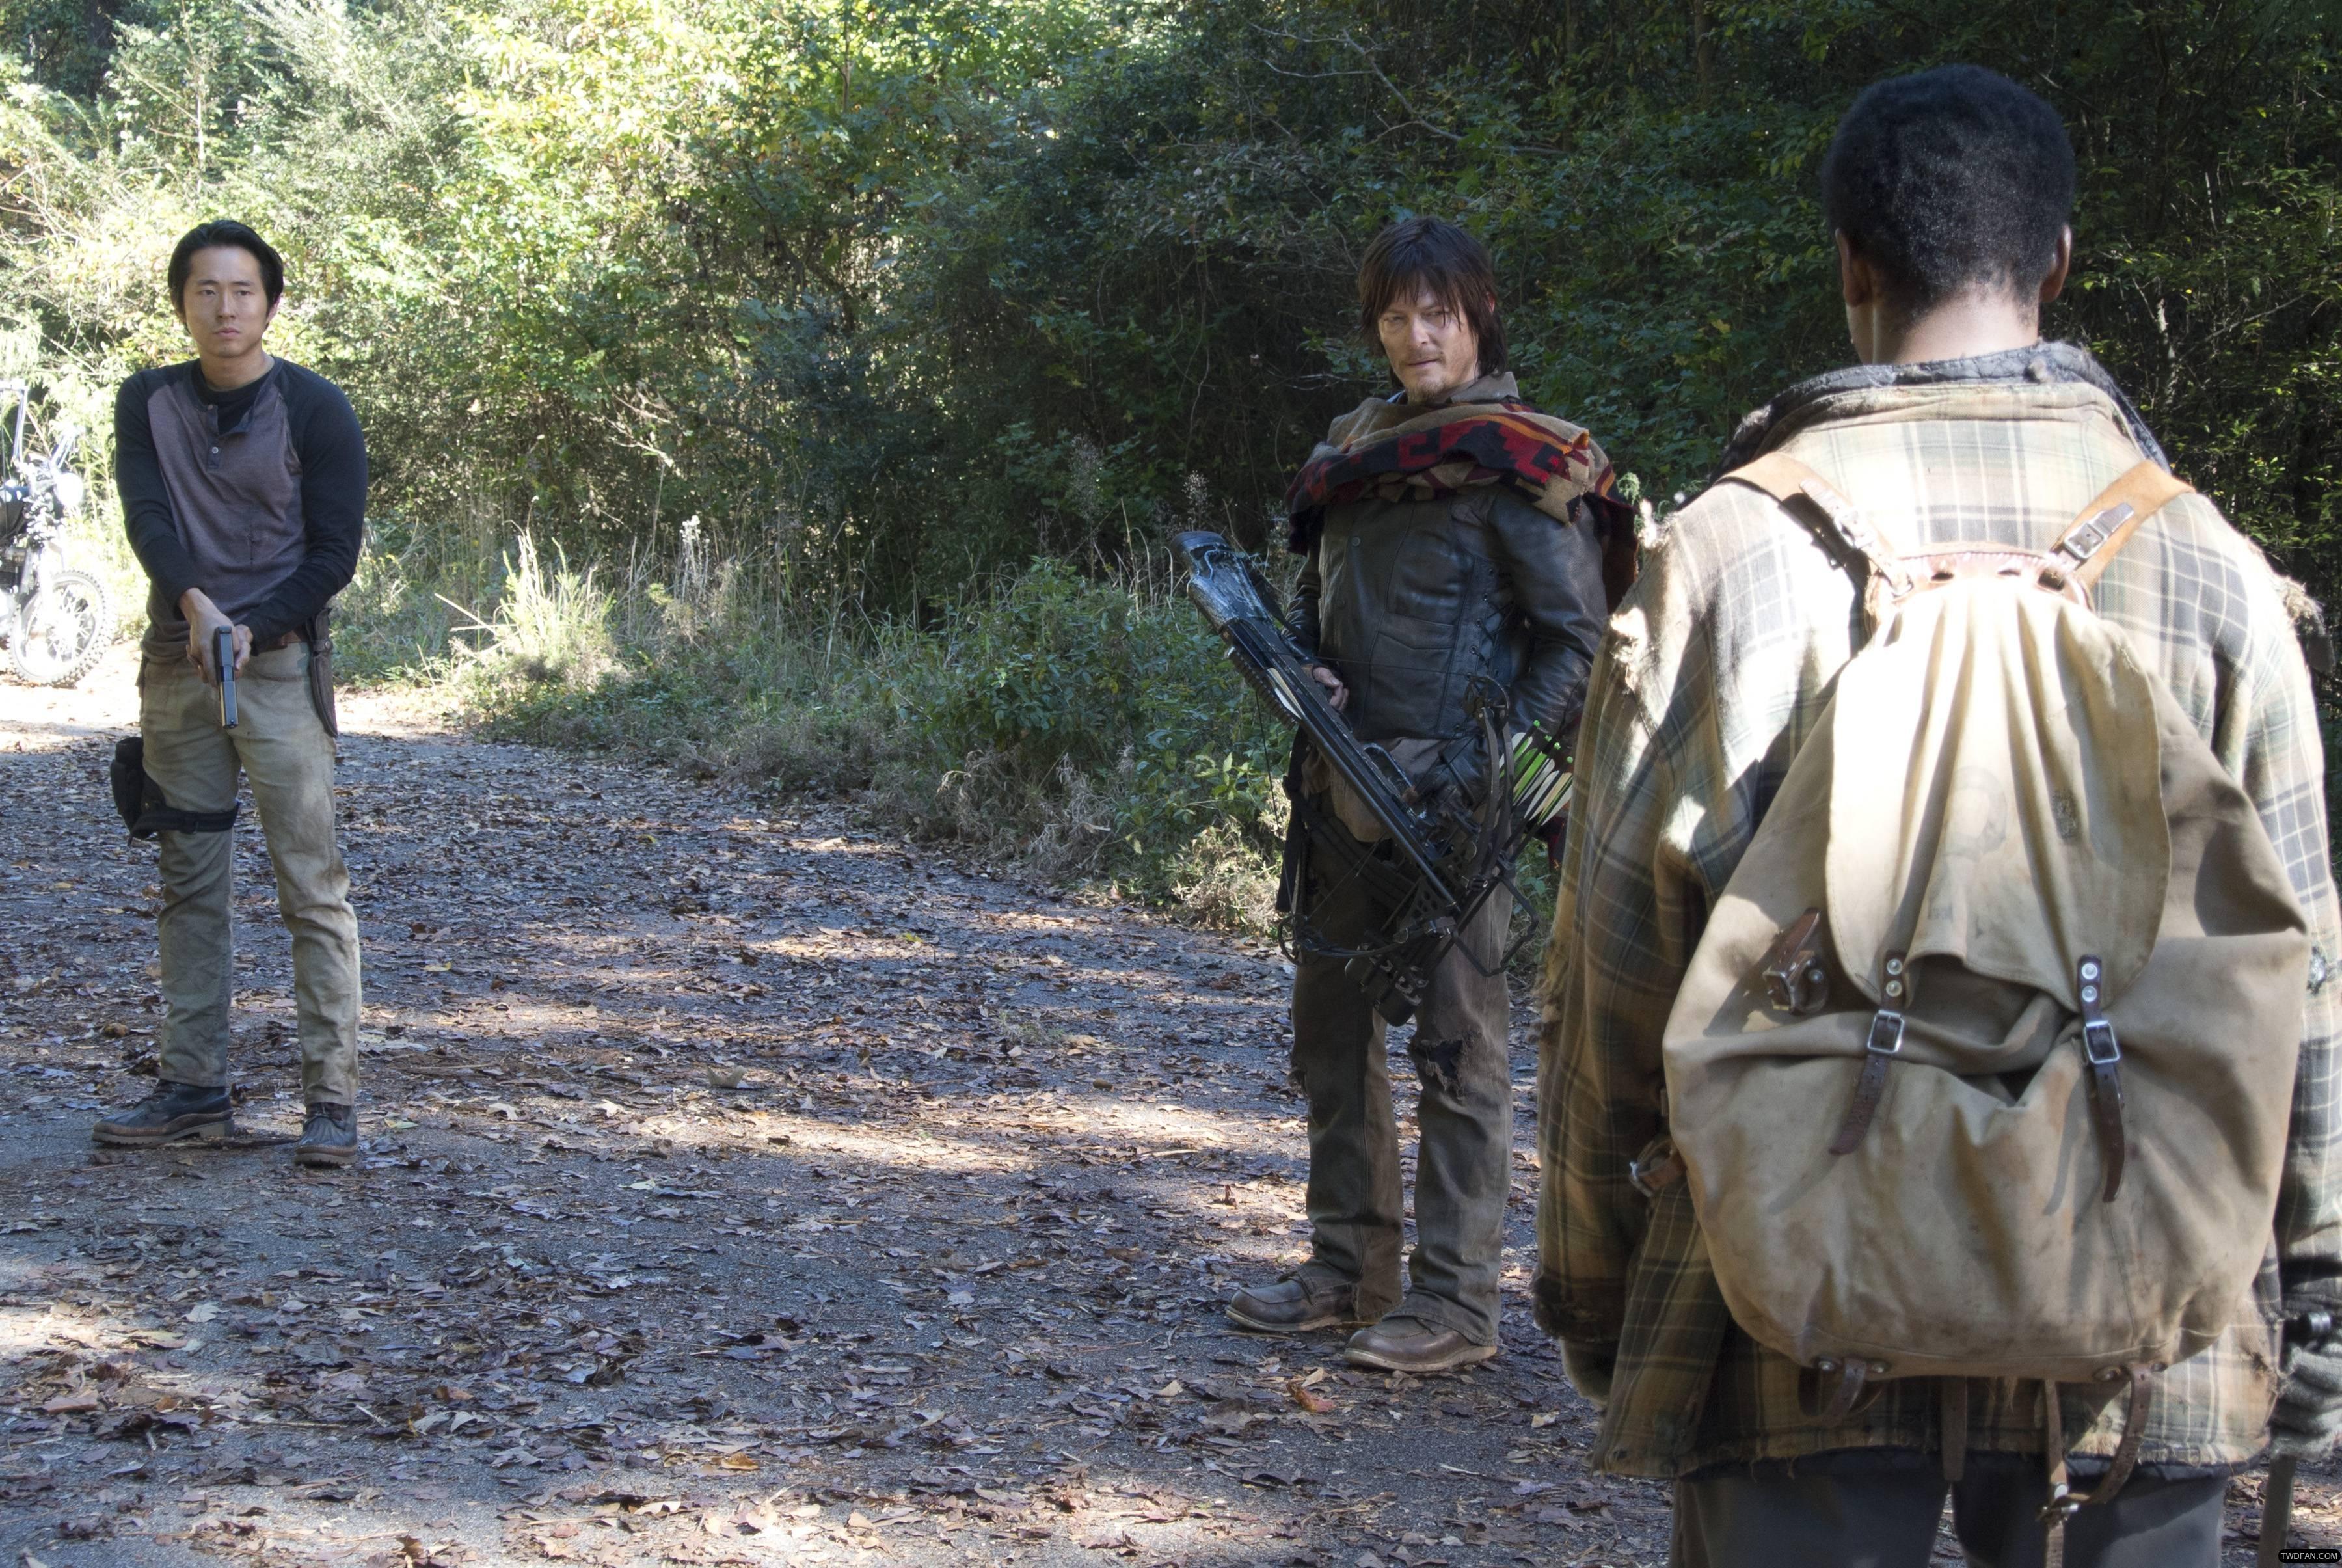 glenn-daryl-bob-the-walking-dead-4-temporada-alone